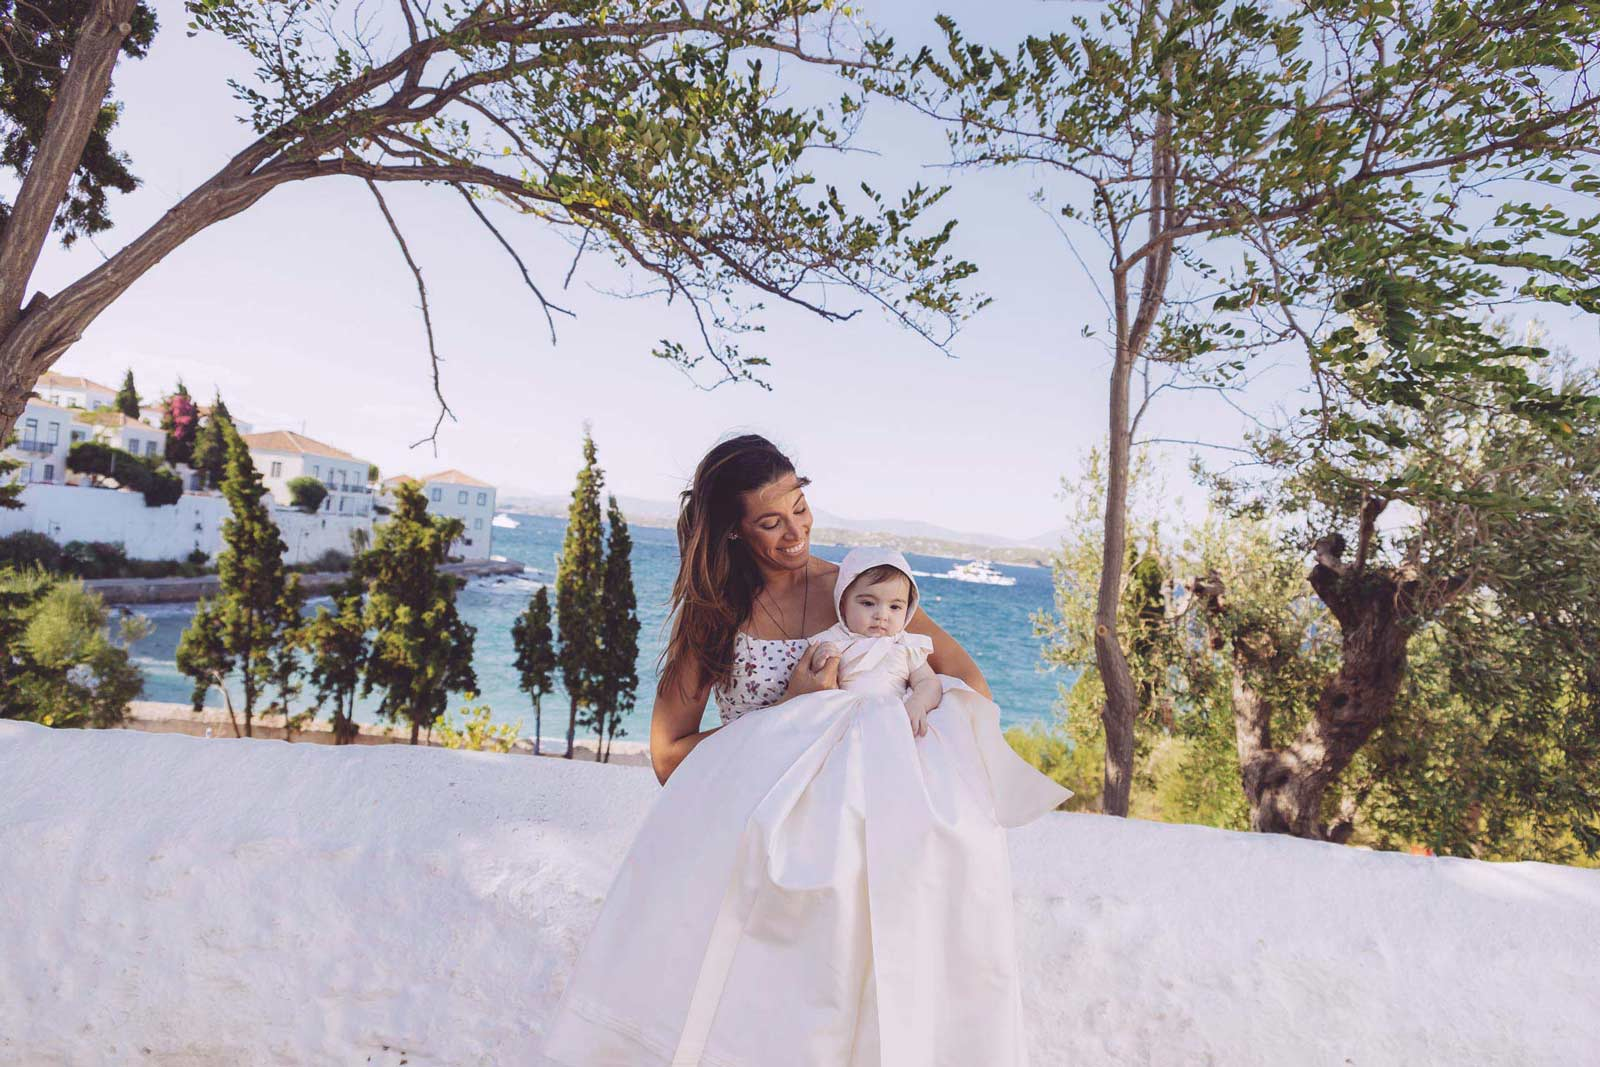 098 PhotoVaptisis βαπτιση σπετσεσ φωτογραφοσ vaptisi koritsi agios nikolaos spestes island photographer